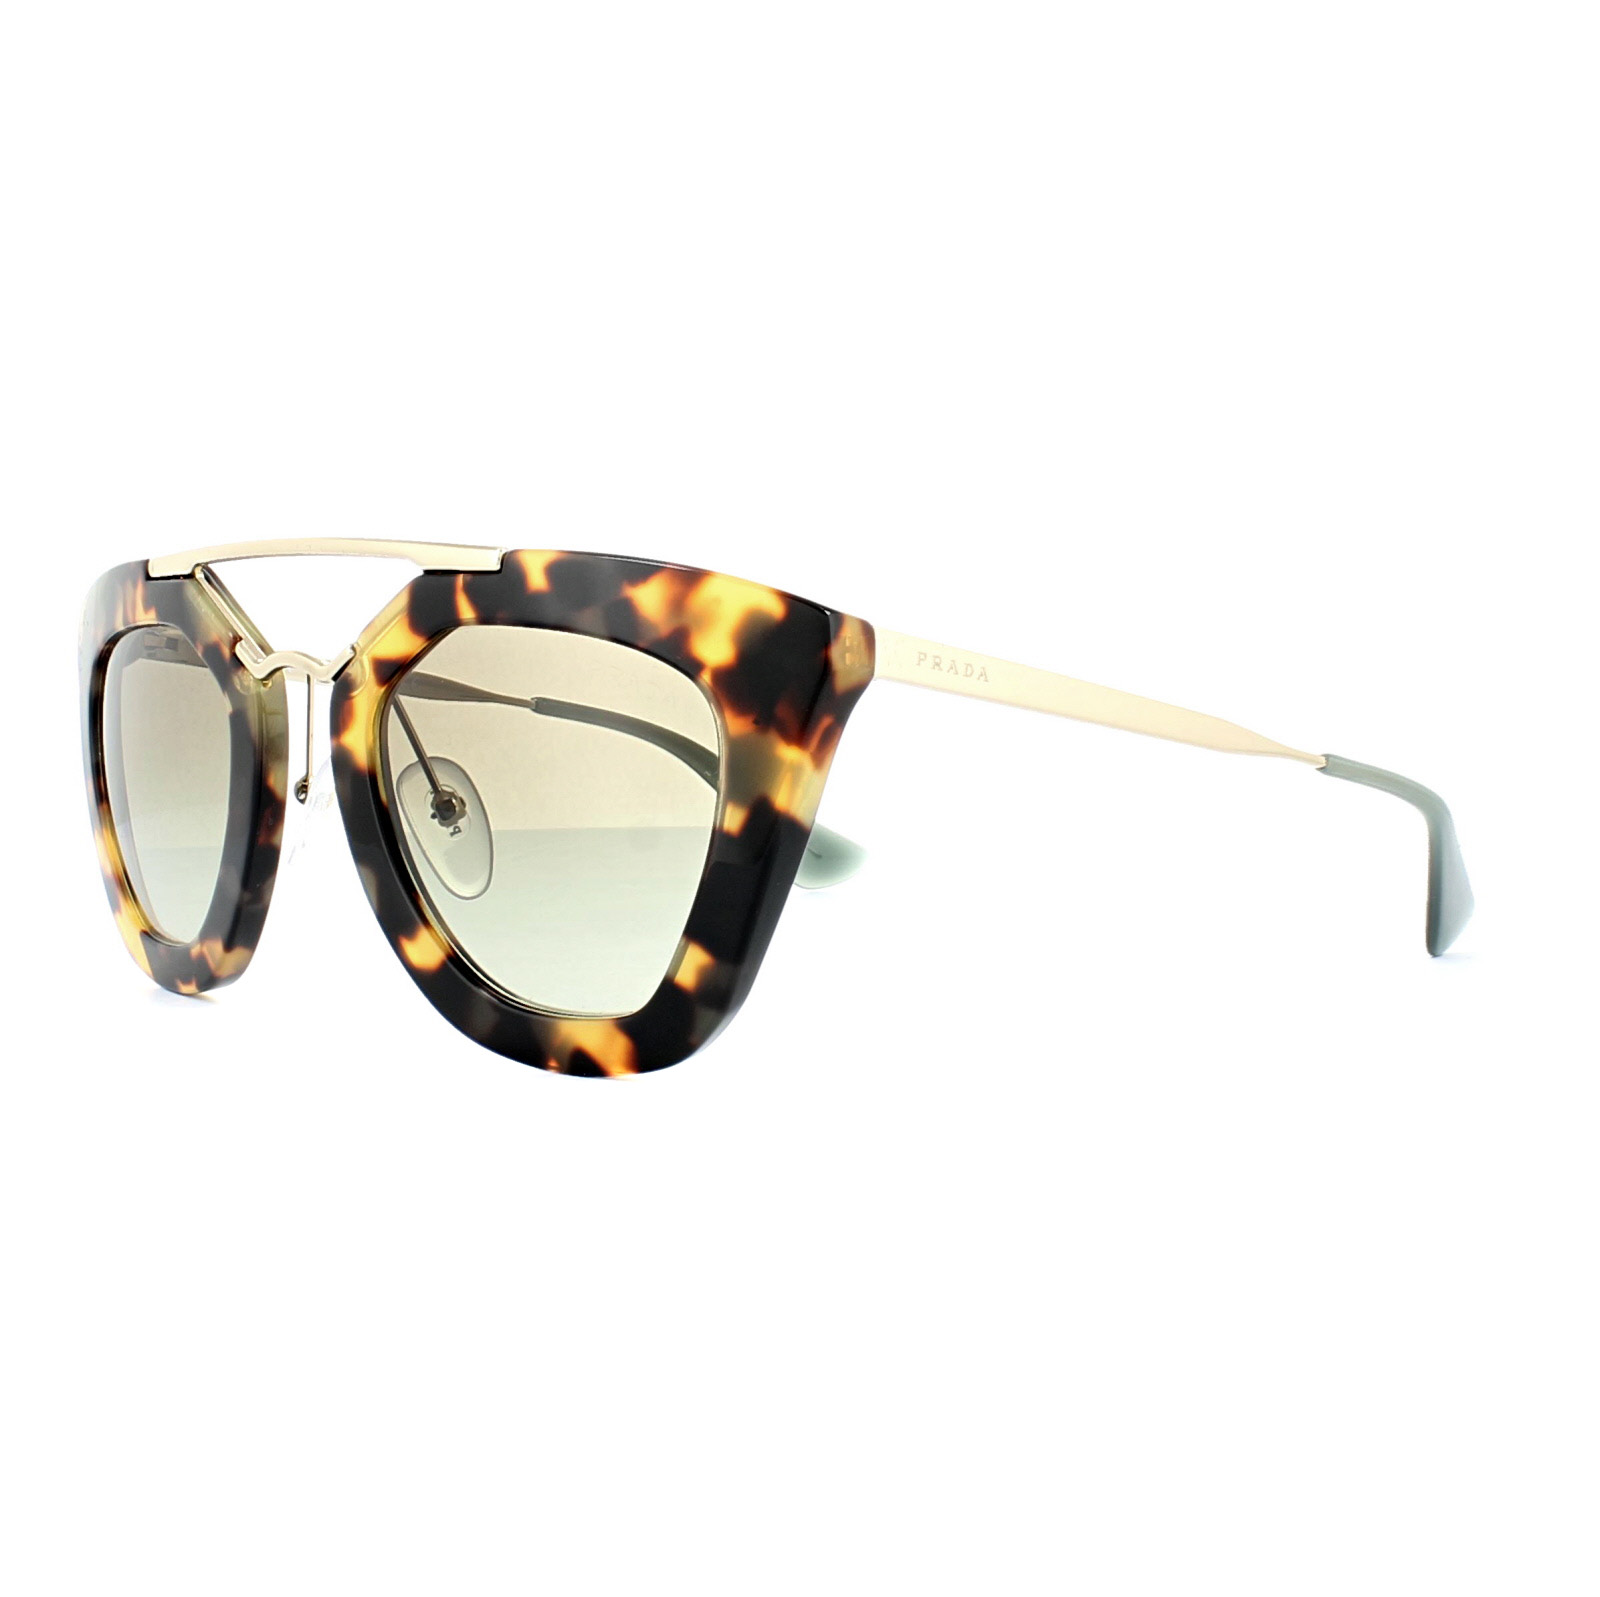 c81b514bf4c Sentinel Prada Sunglasses 09QS 7S04M1 Blonde Havana Green Gradient